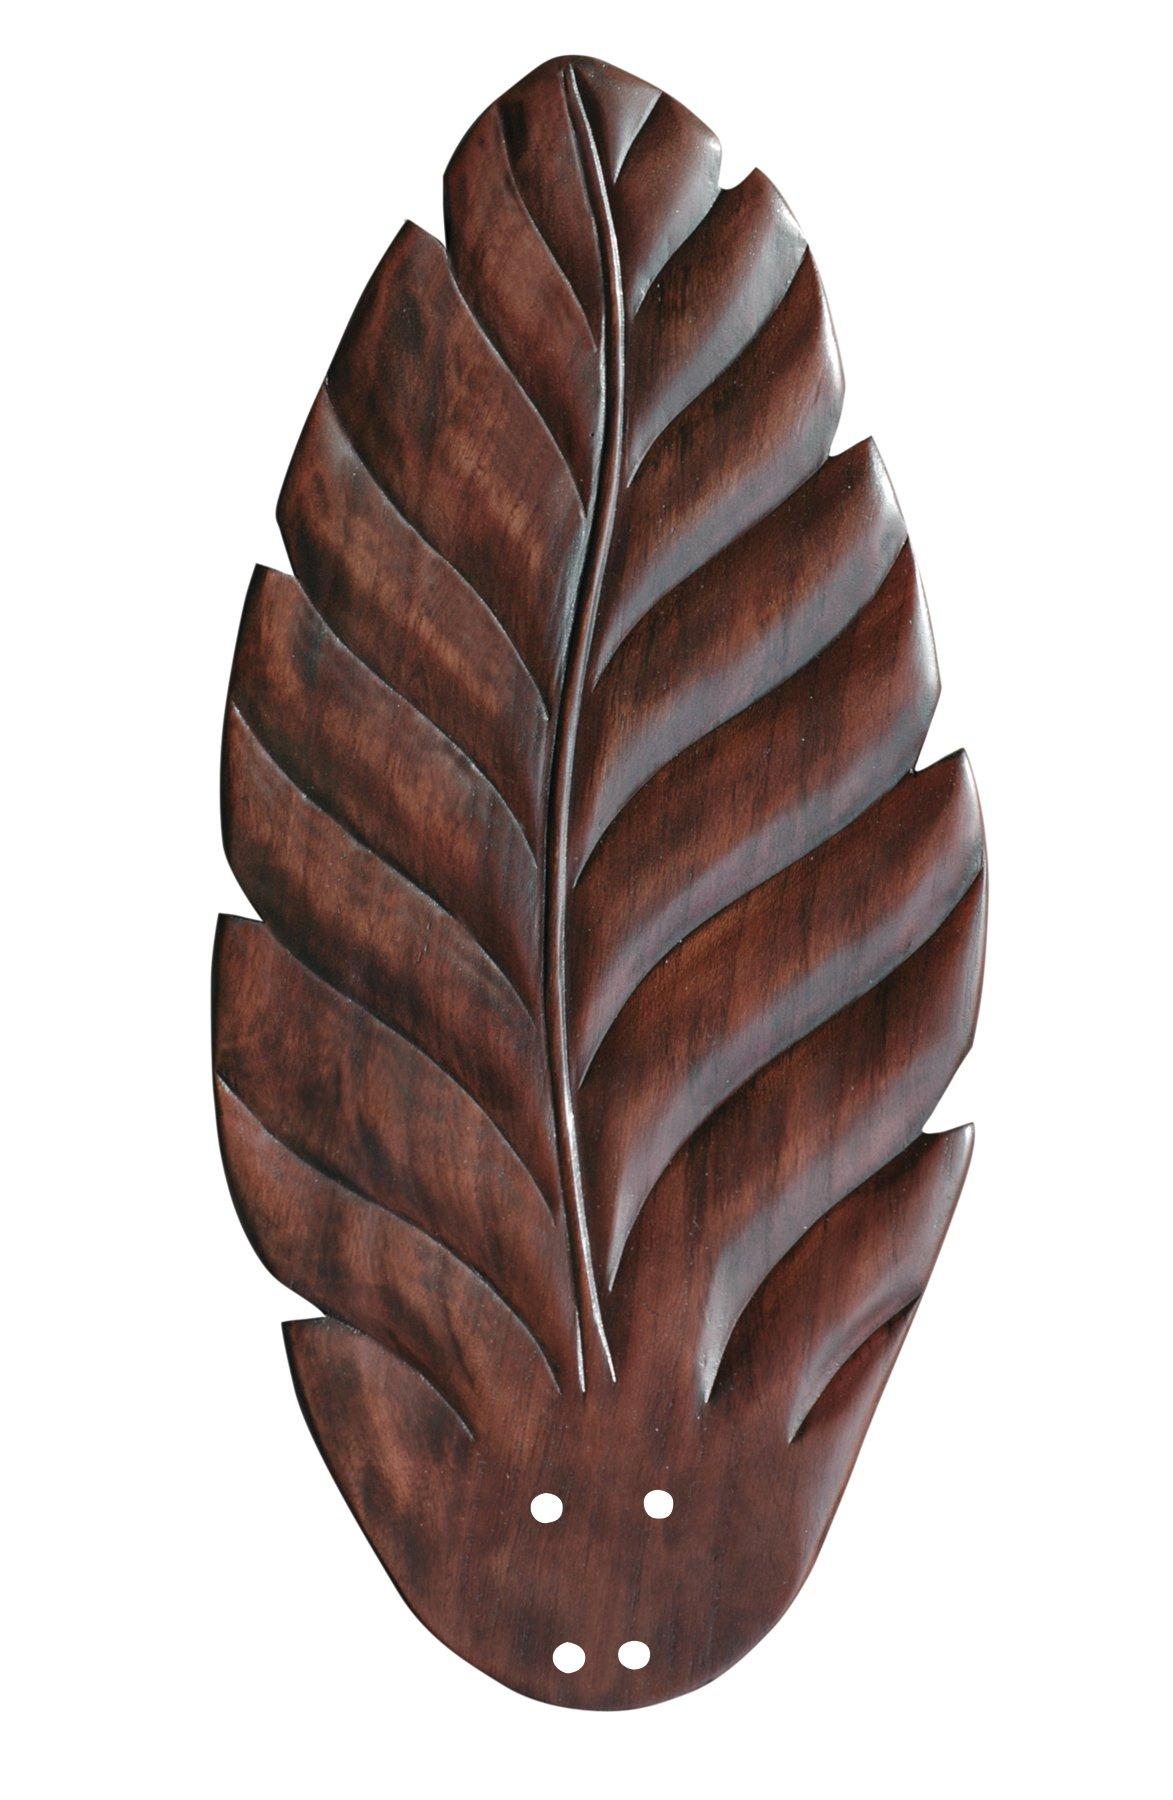 Emerson Ceiling Fans B109DC 22-Inch Hand Carved Leaf Indoor-Outdoor Ceiling Fan Blades, Dark Cherry, Damp Location, Set of 5 Blades